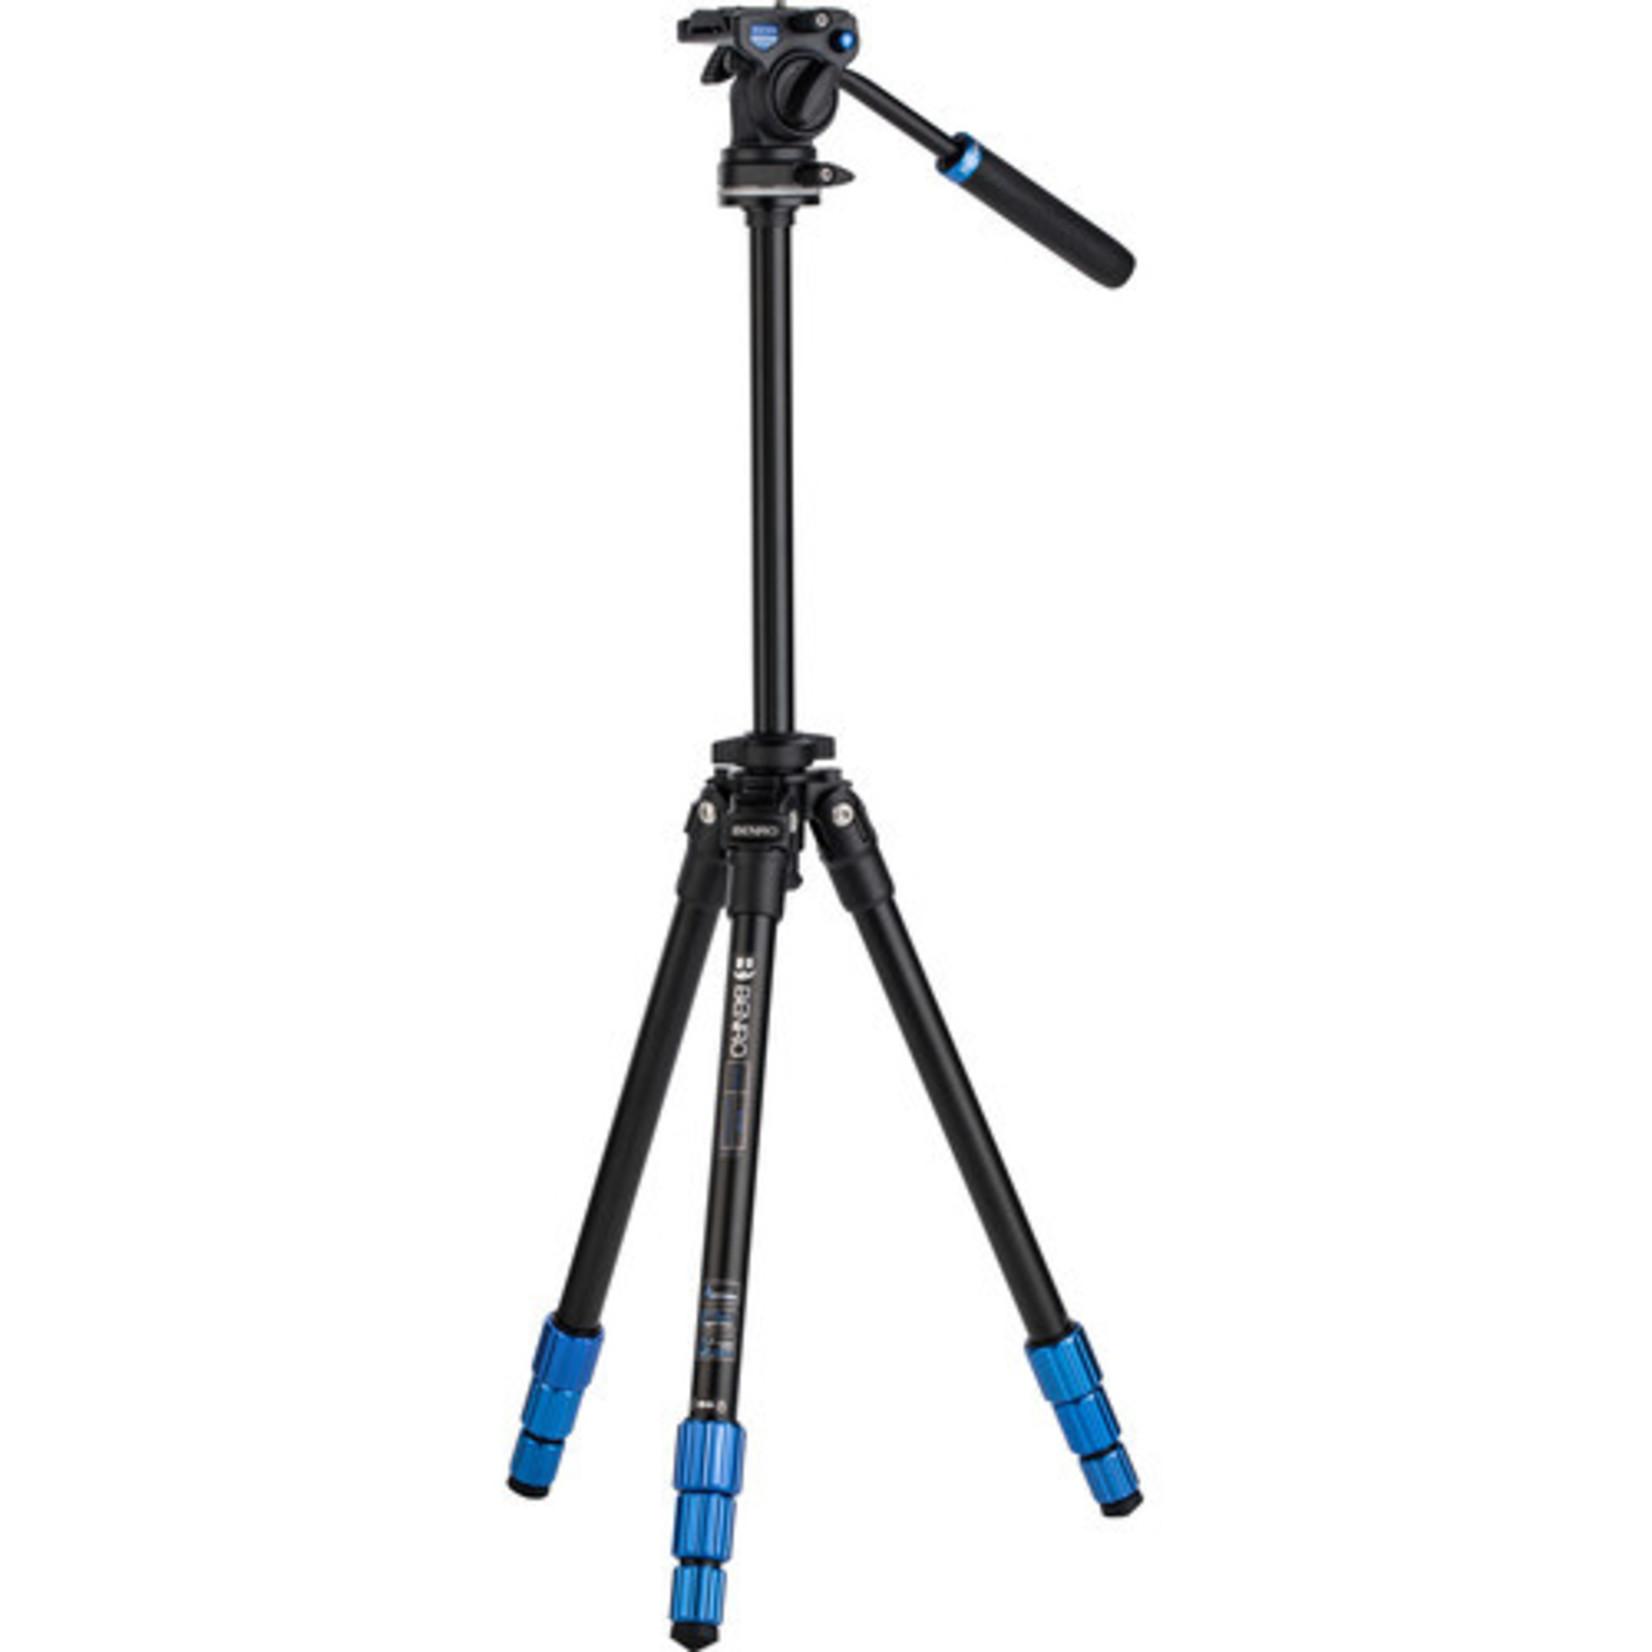 Benro Benro SLIM Video Tripod Kit (Aluminum)